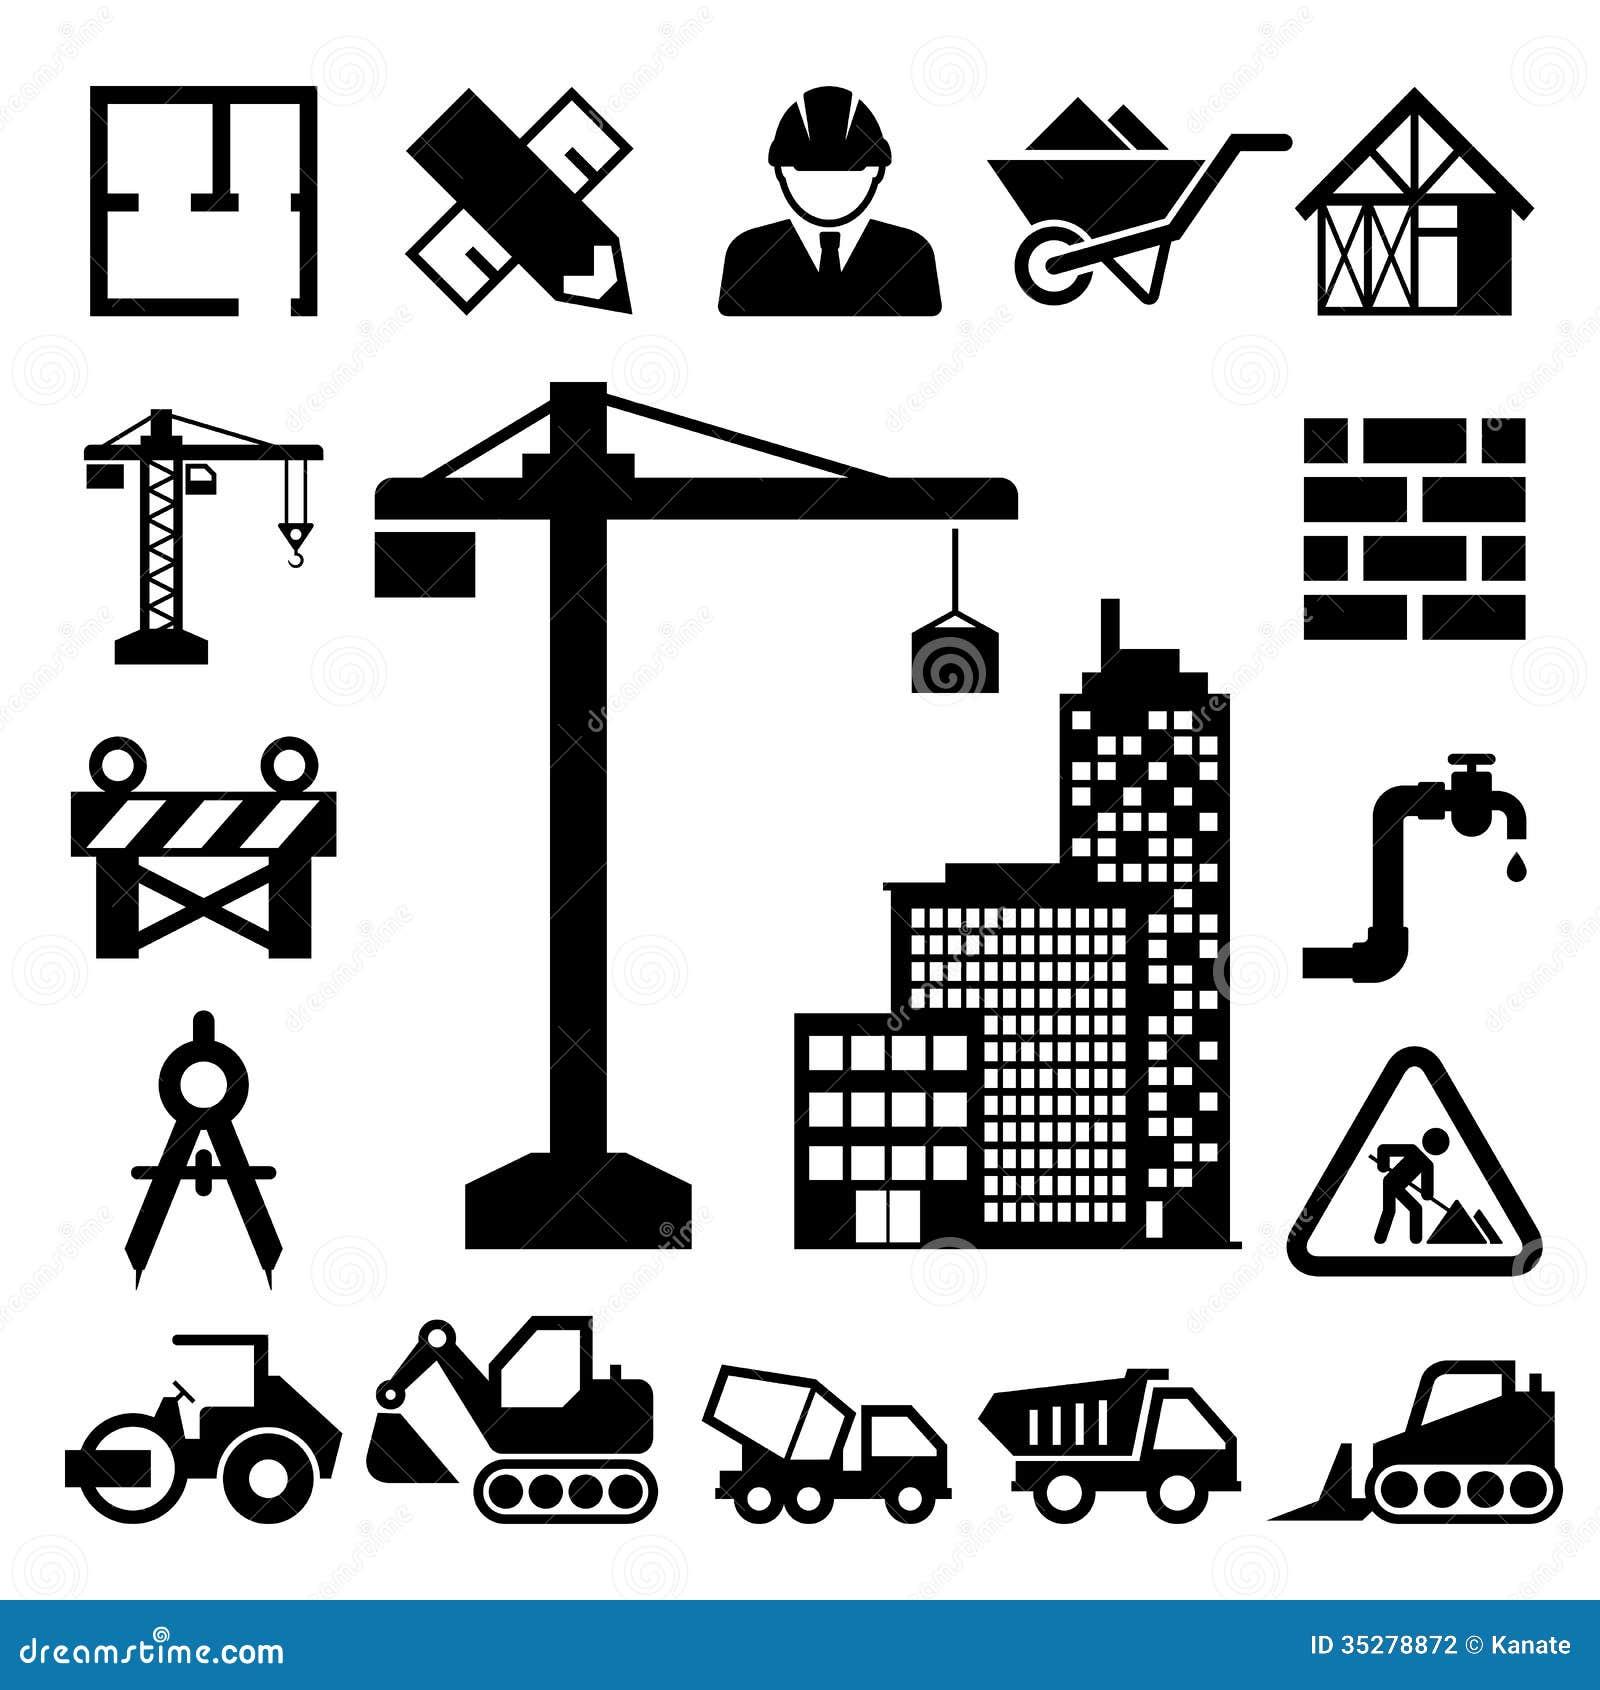 Construction Icons Set Stock Photography  Image: 35278872 - Blueprint Of House